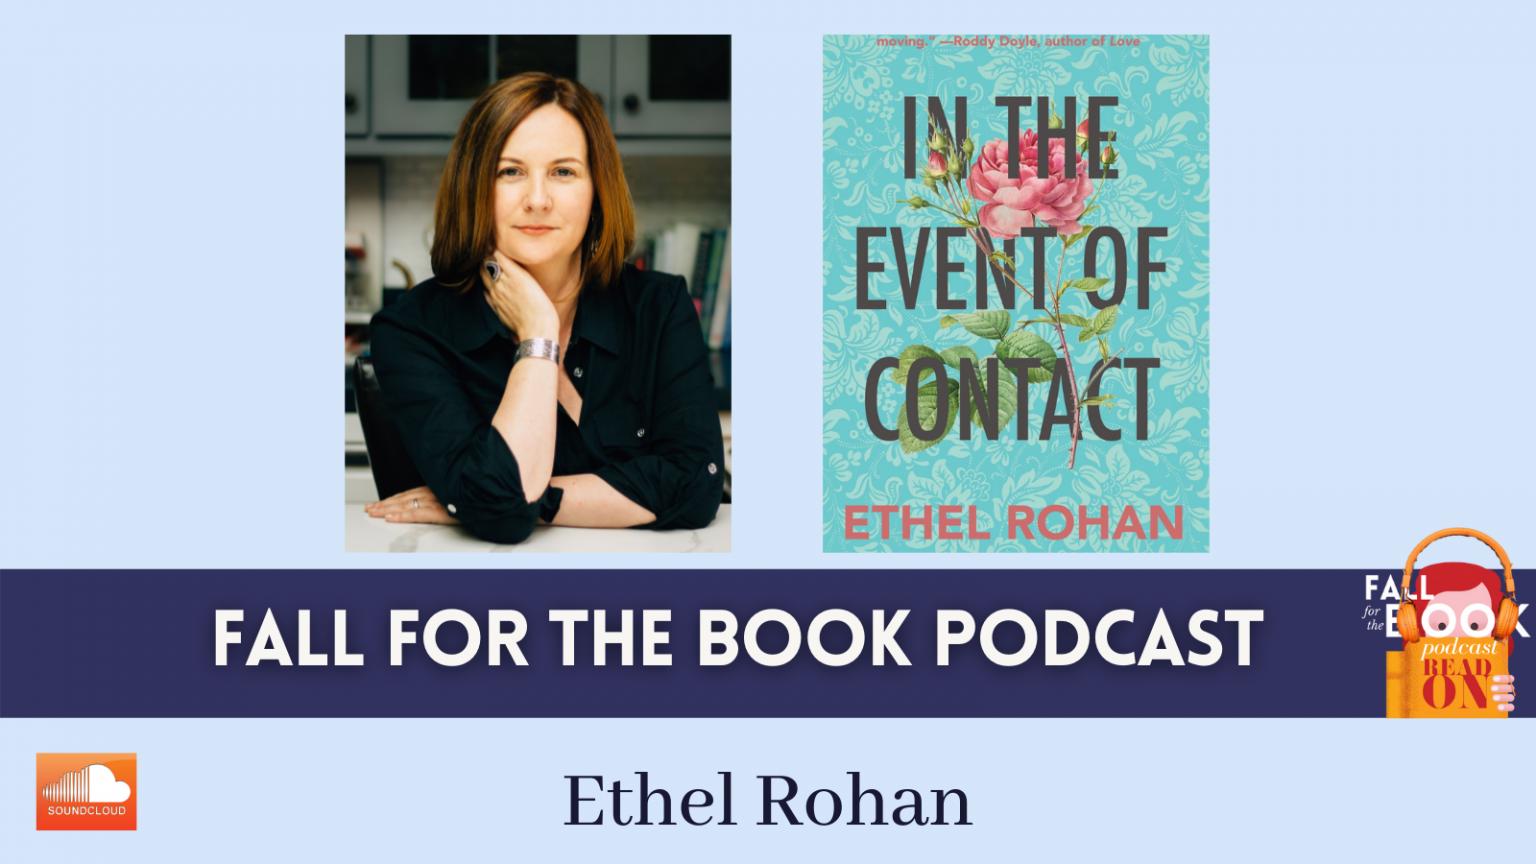 Ethel Rohan Podcast Graphic